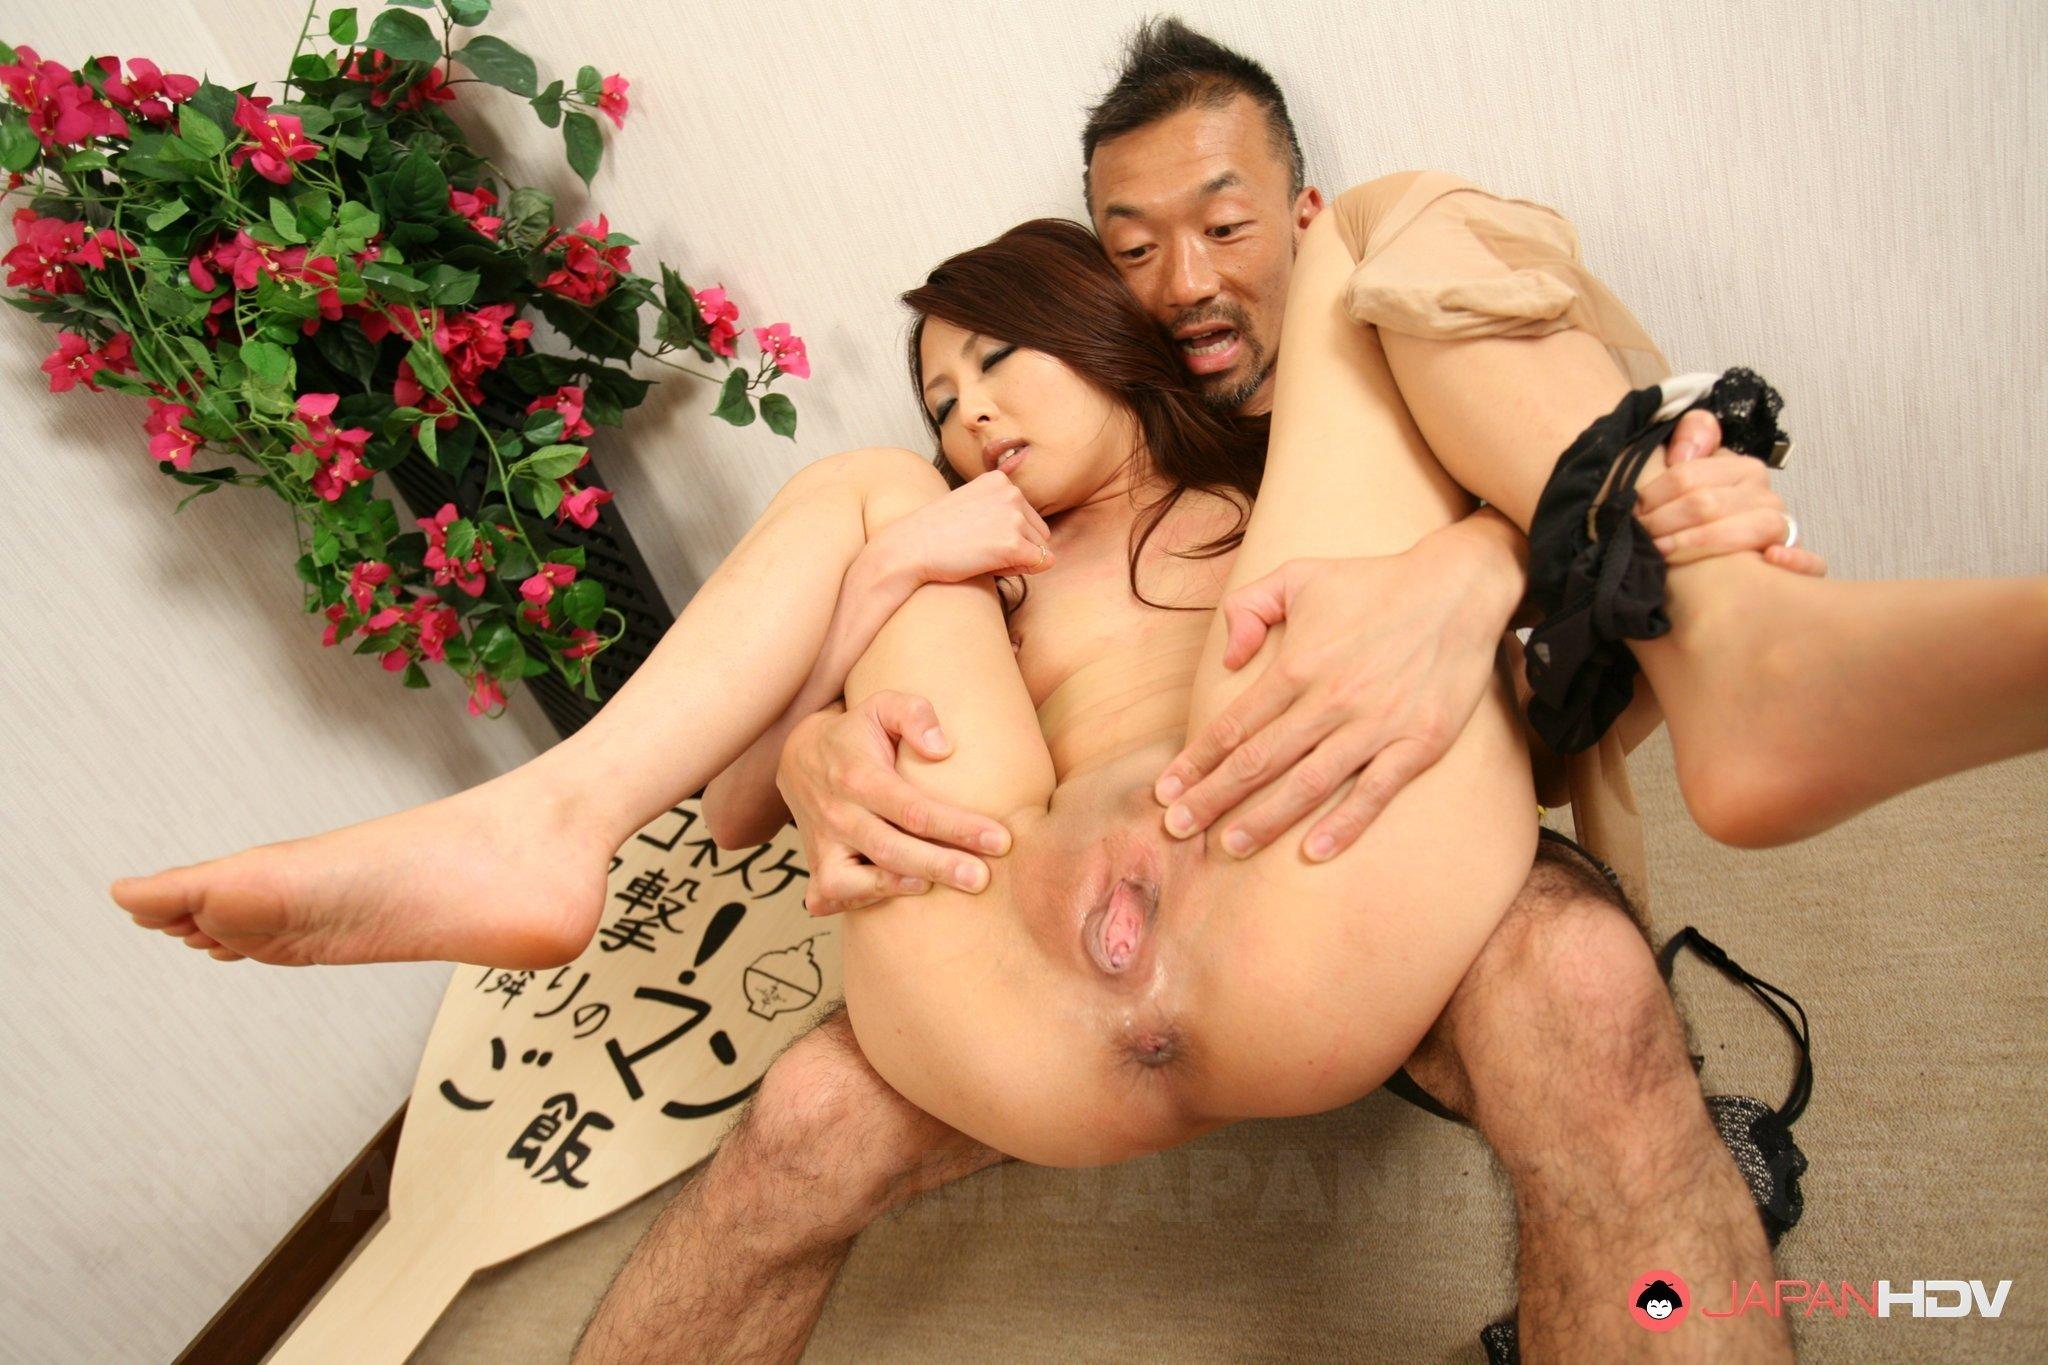 Порно Китай Реально